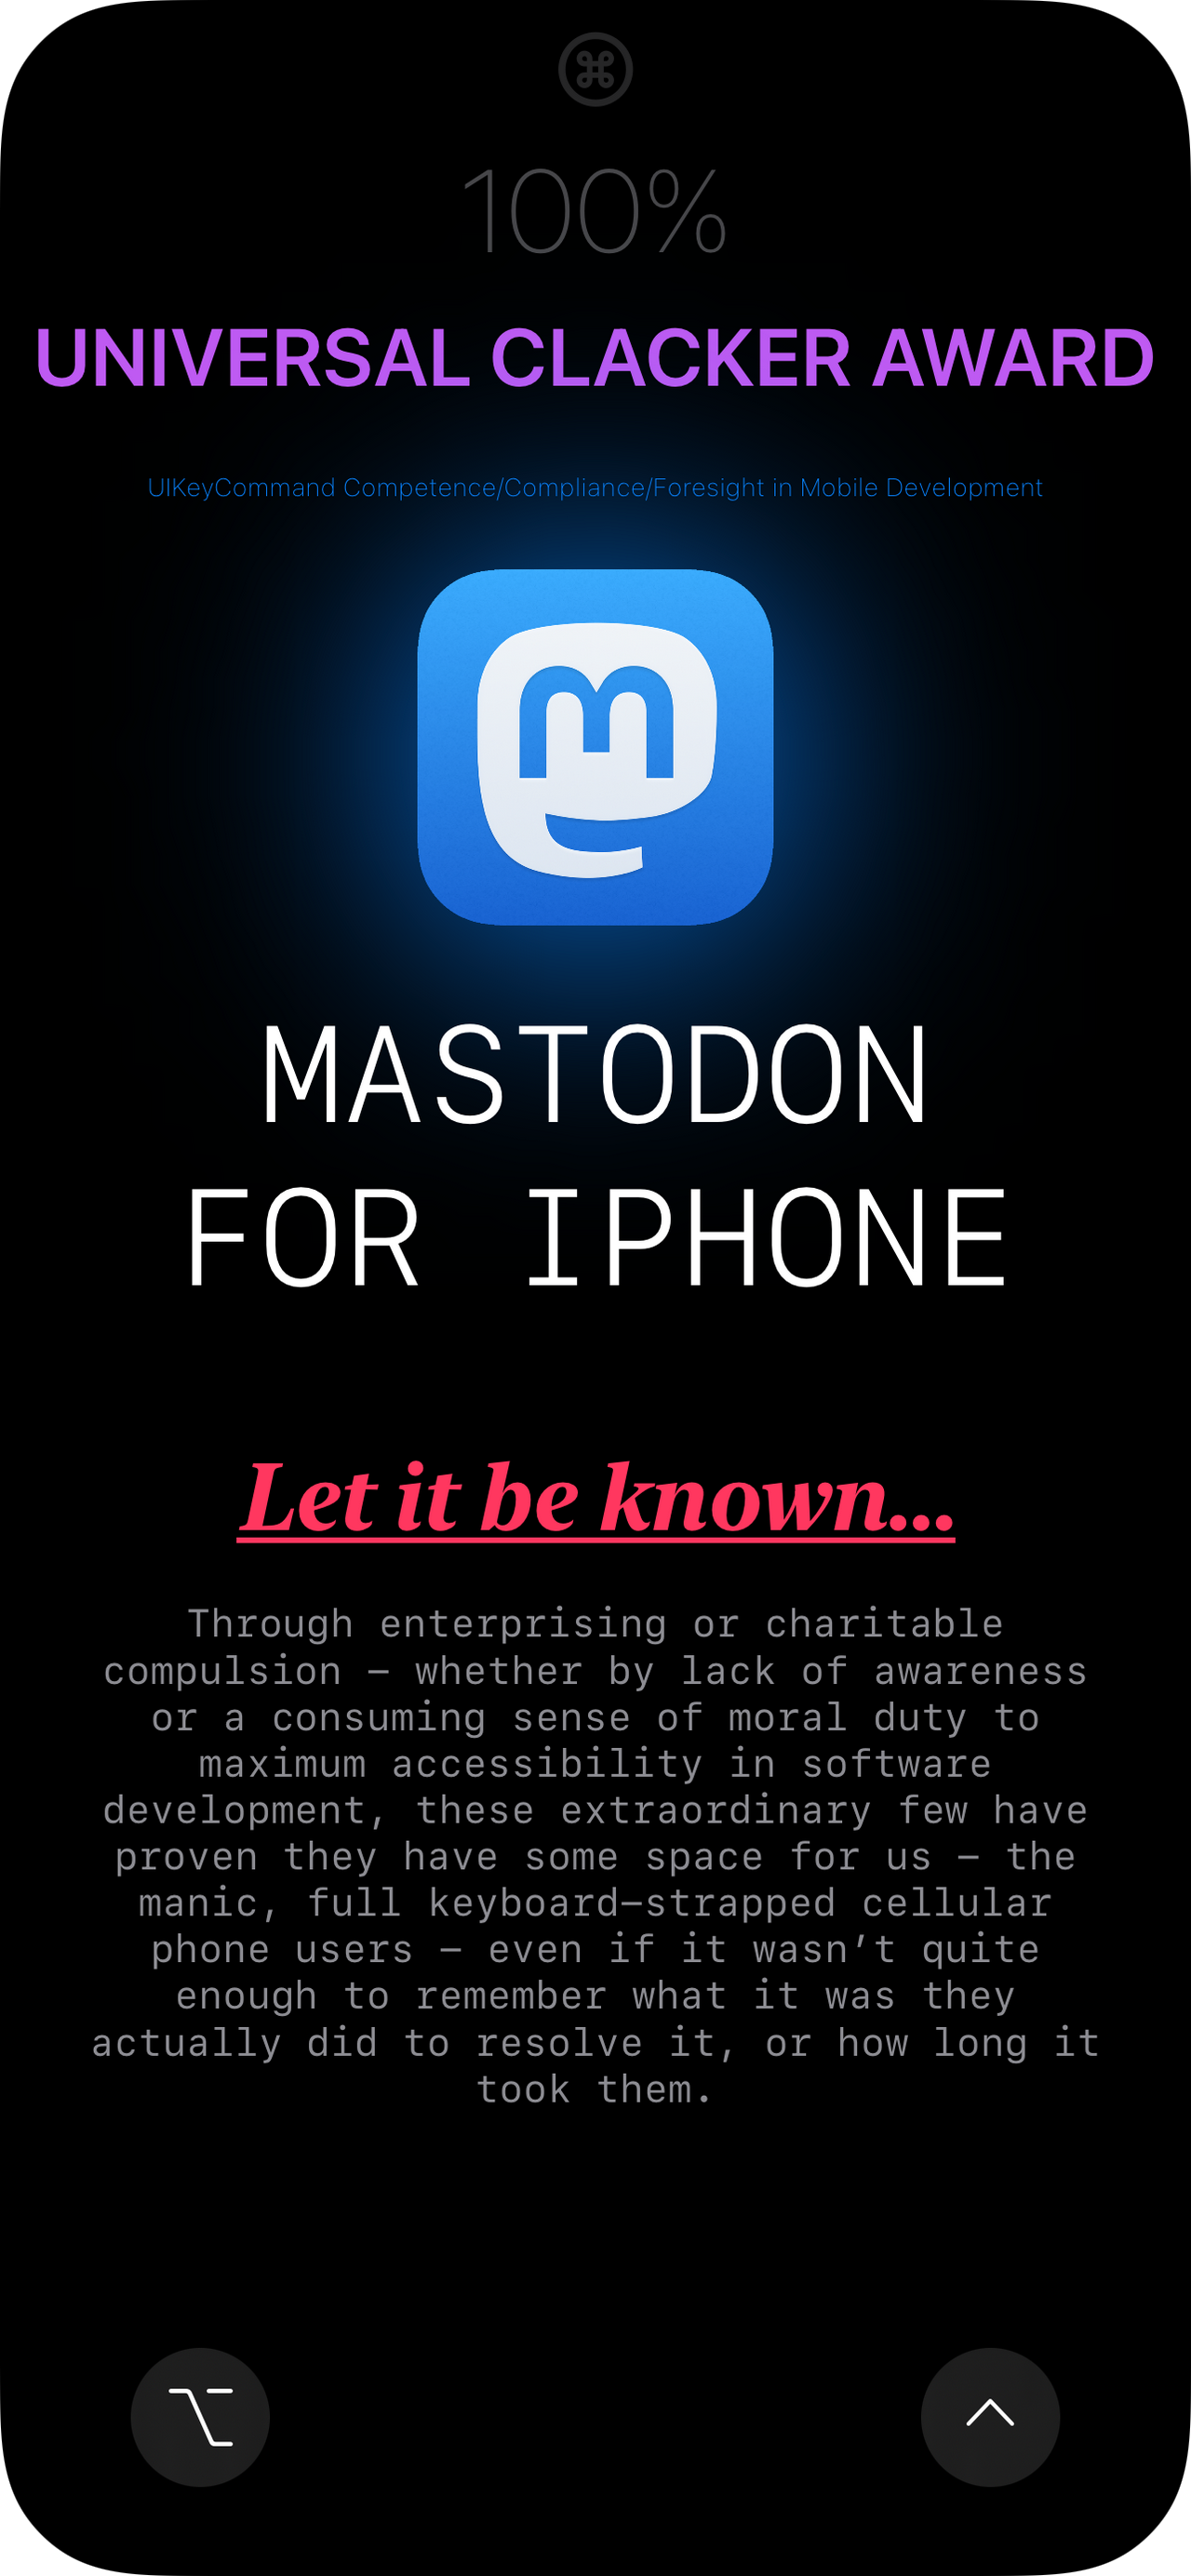 Mastodon for iPhone - Universal Clacker Award